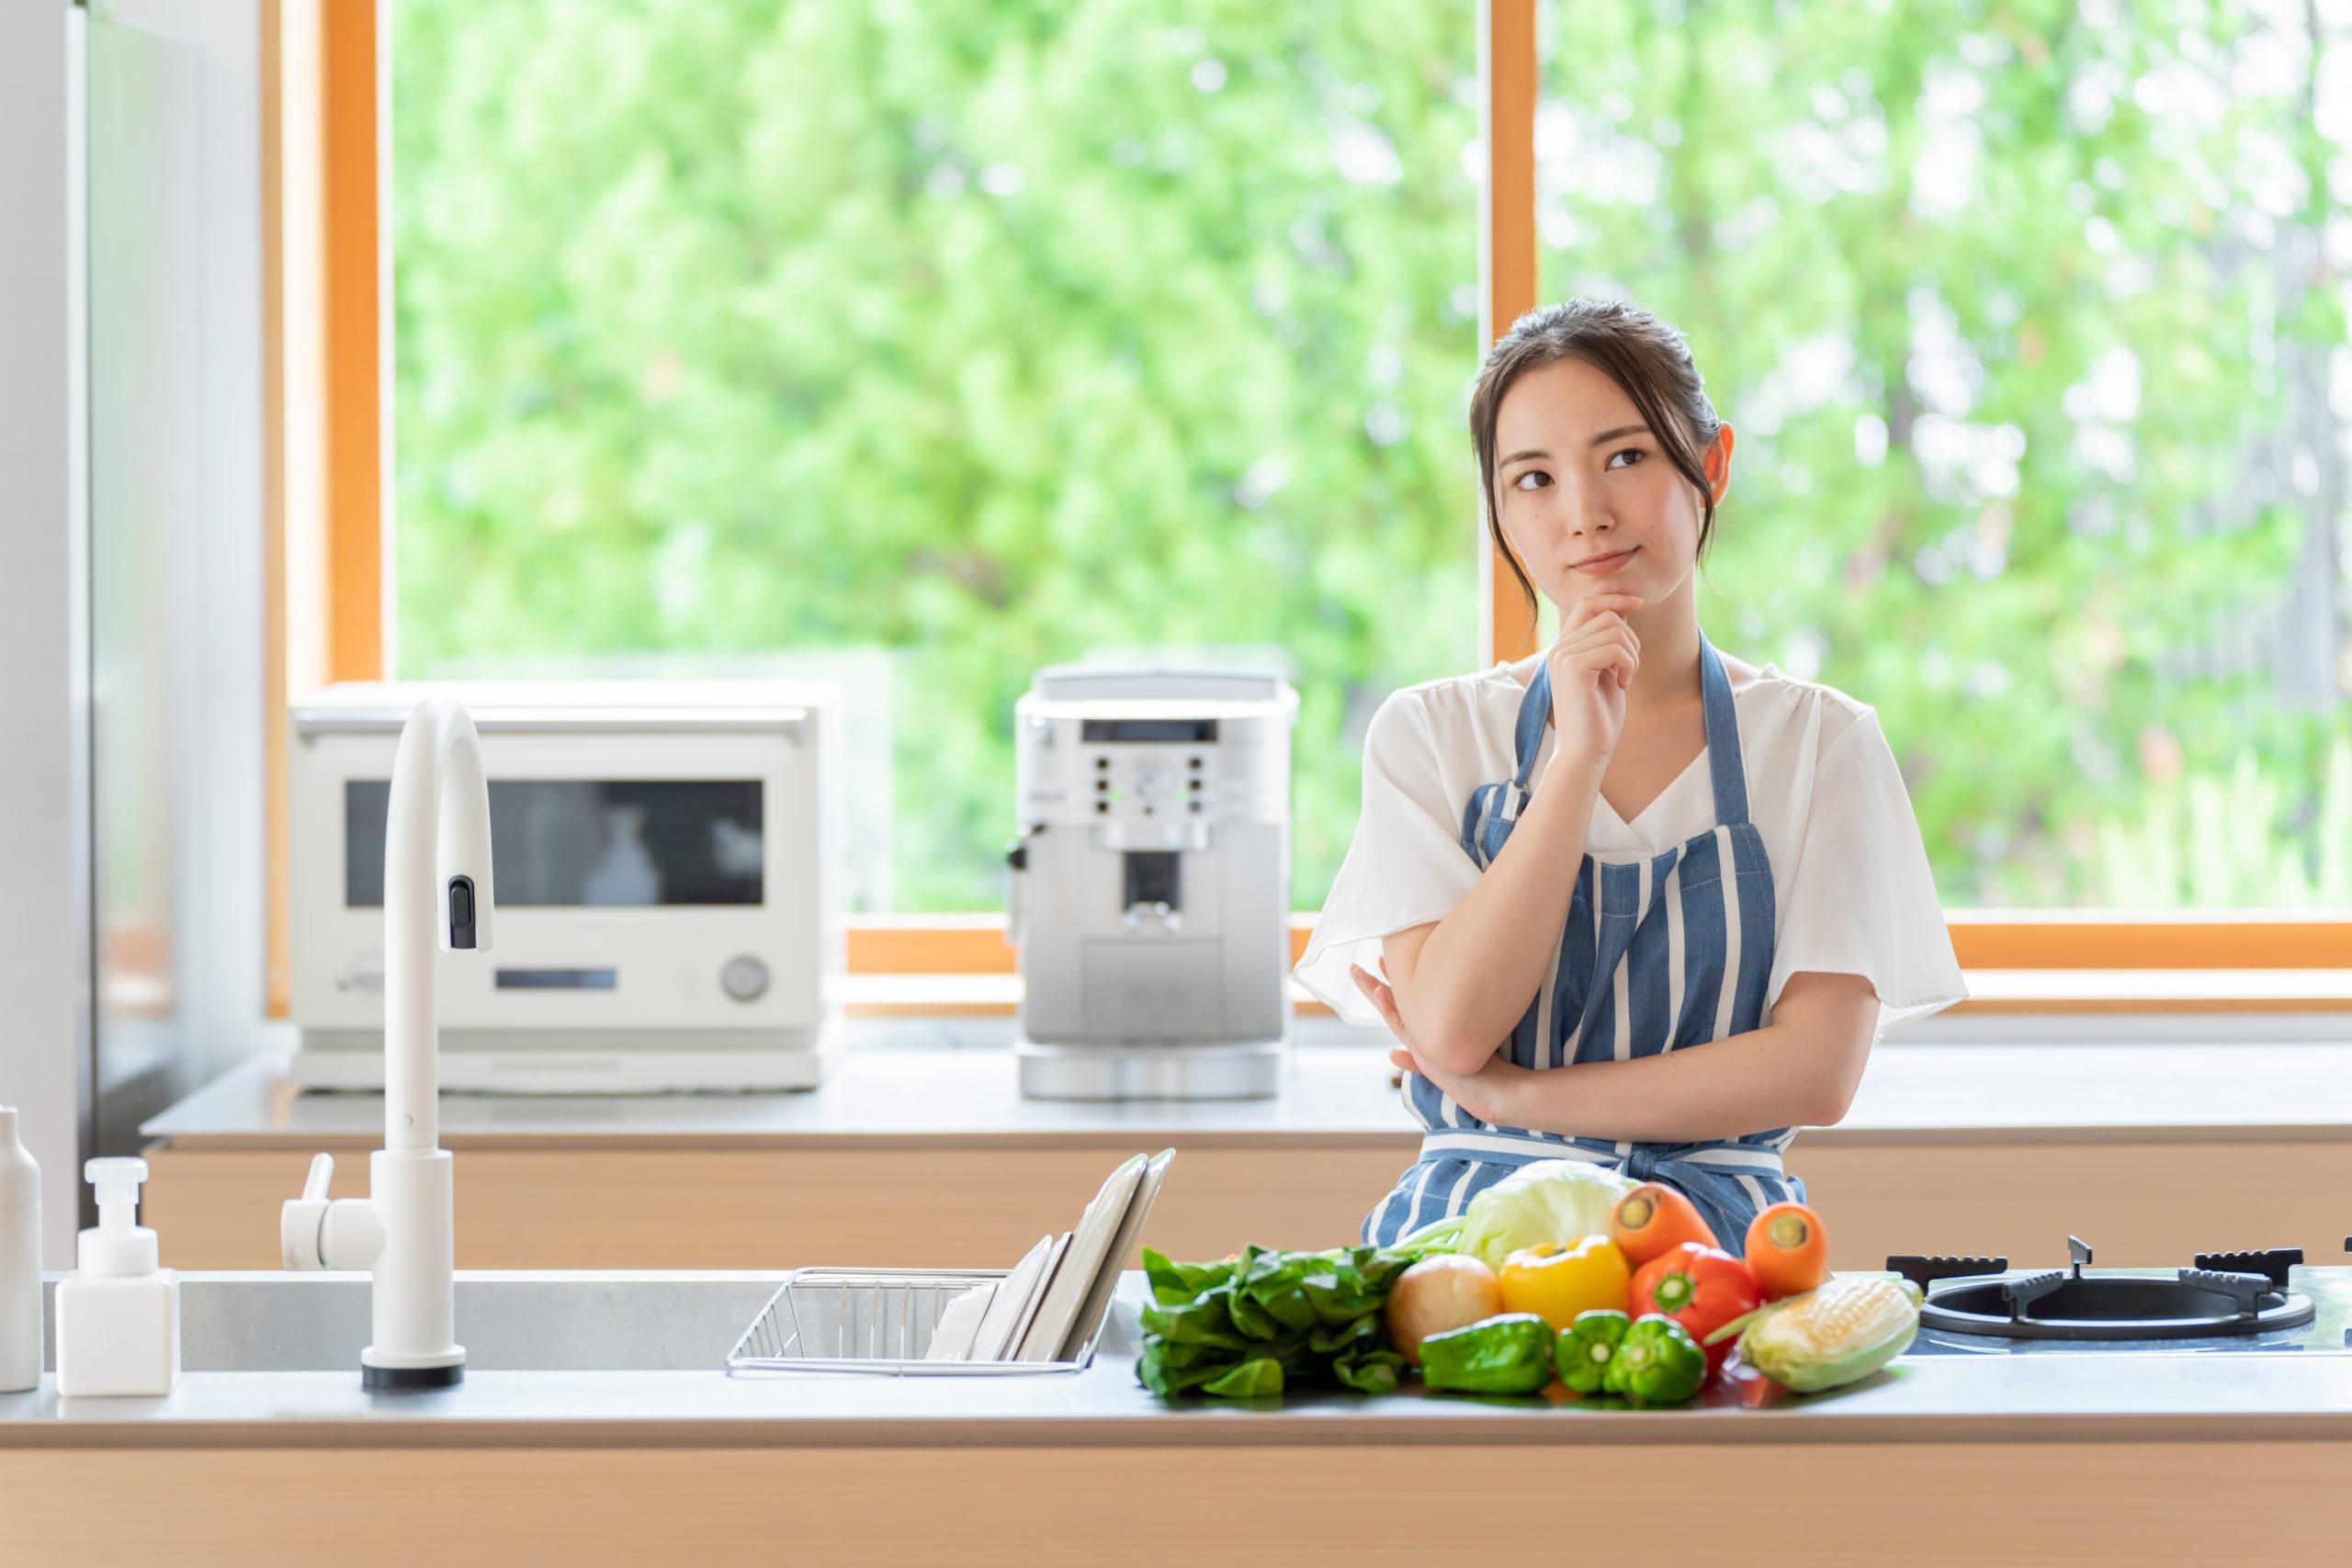 portrait-attractive-asian-woman-thinking-kitchen-1812709528